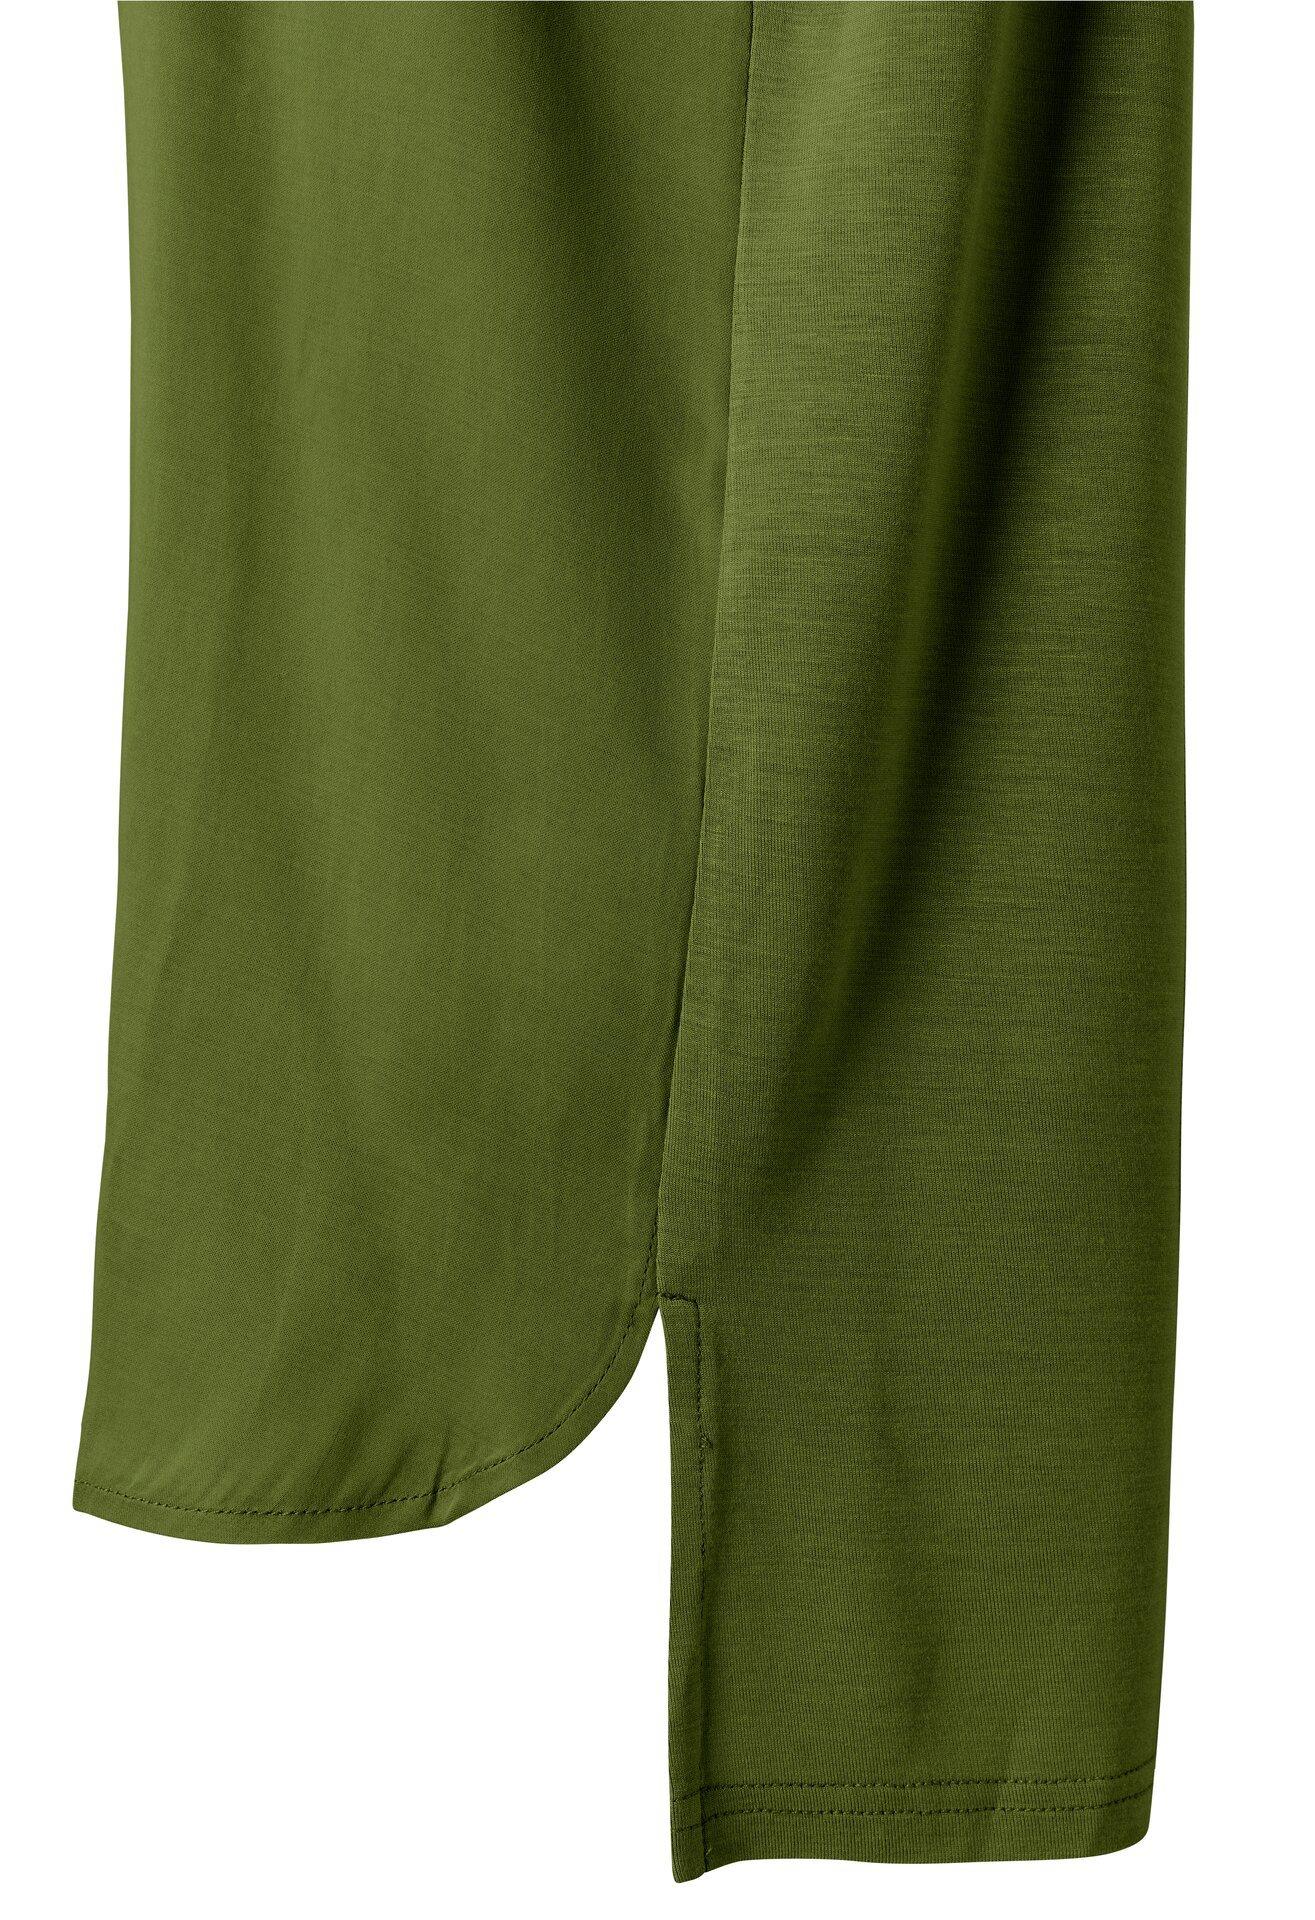 Top Cupro Blend Fabric Mix